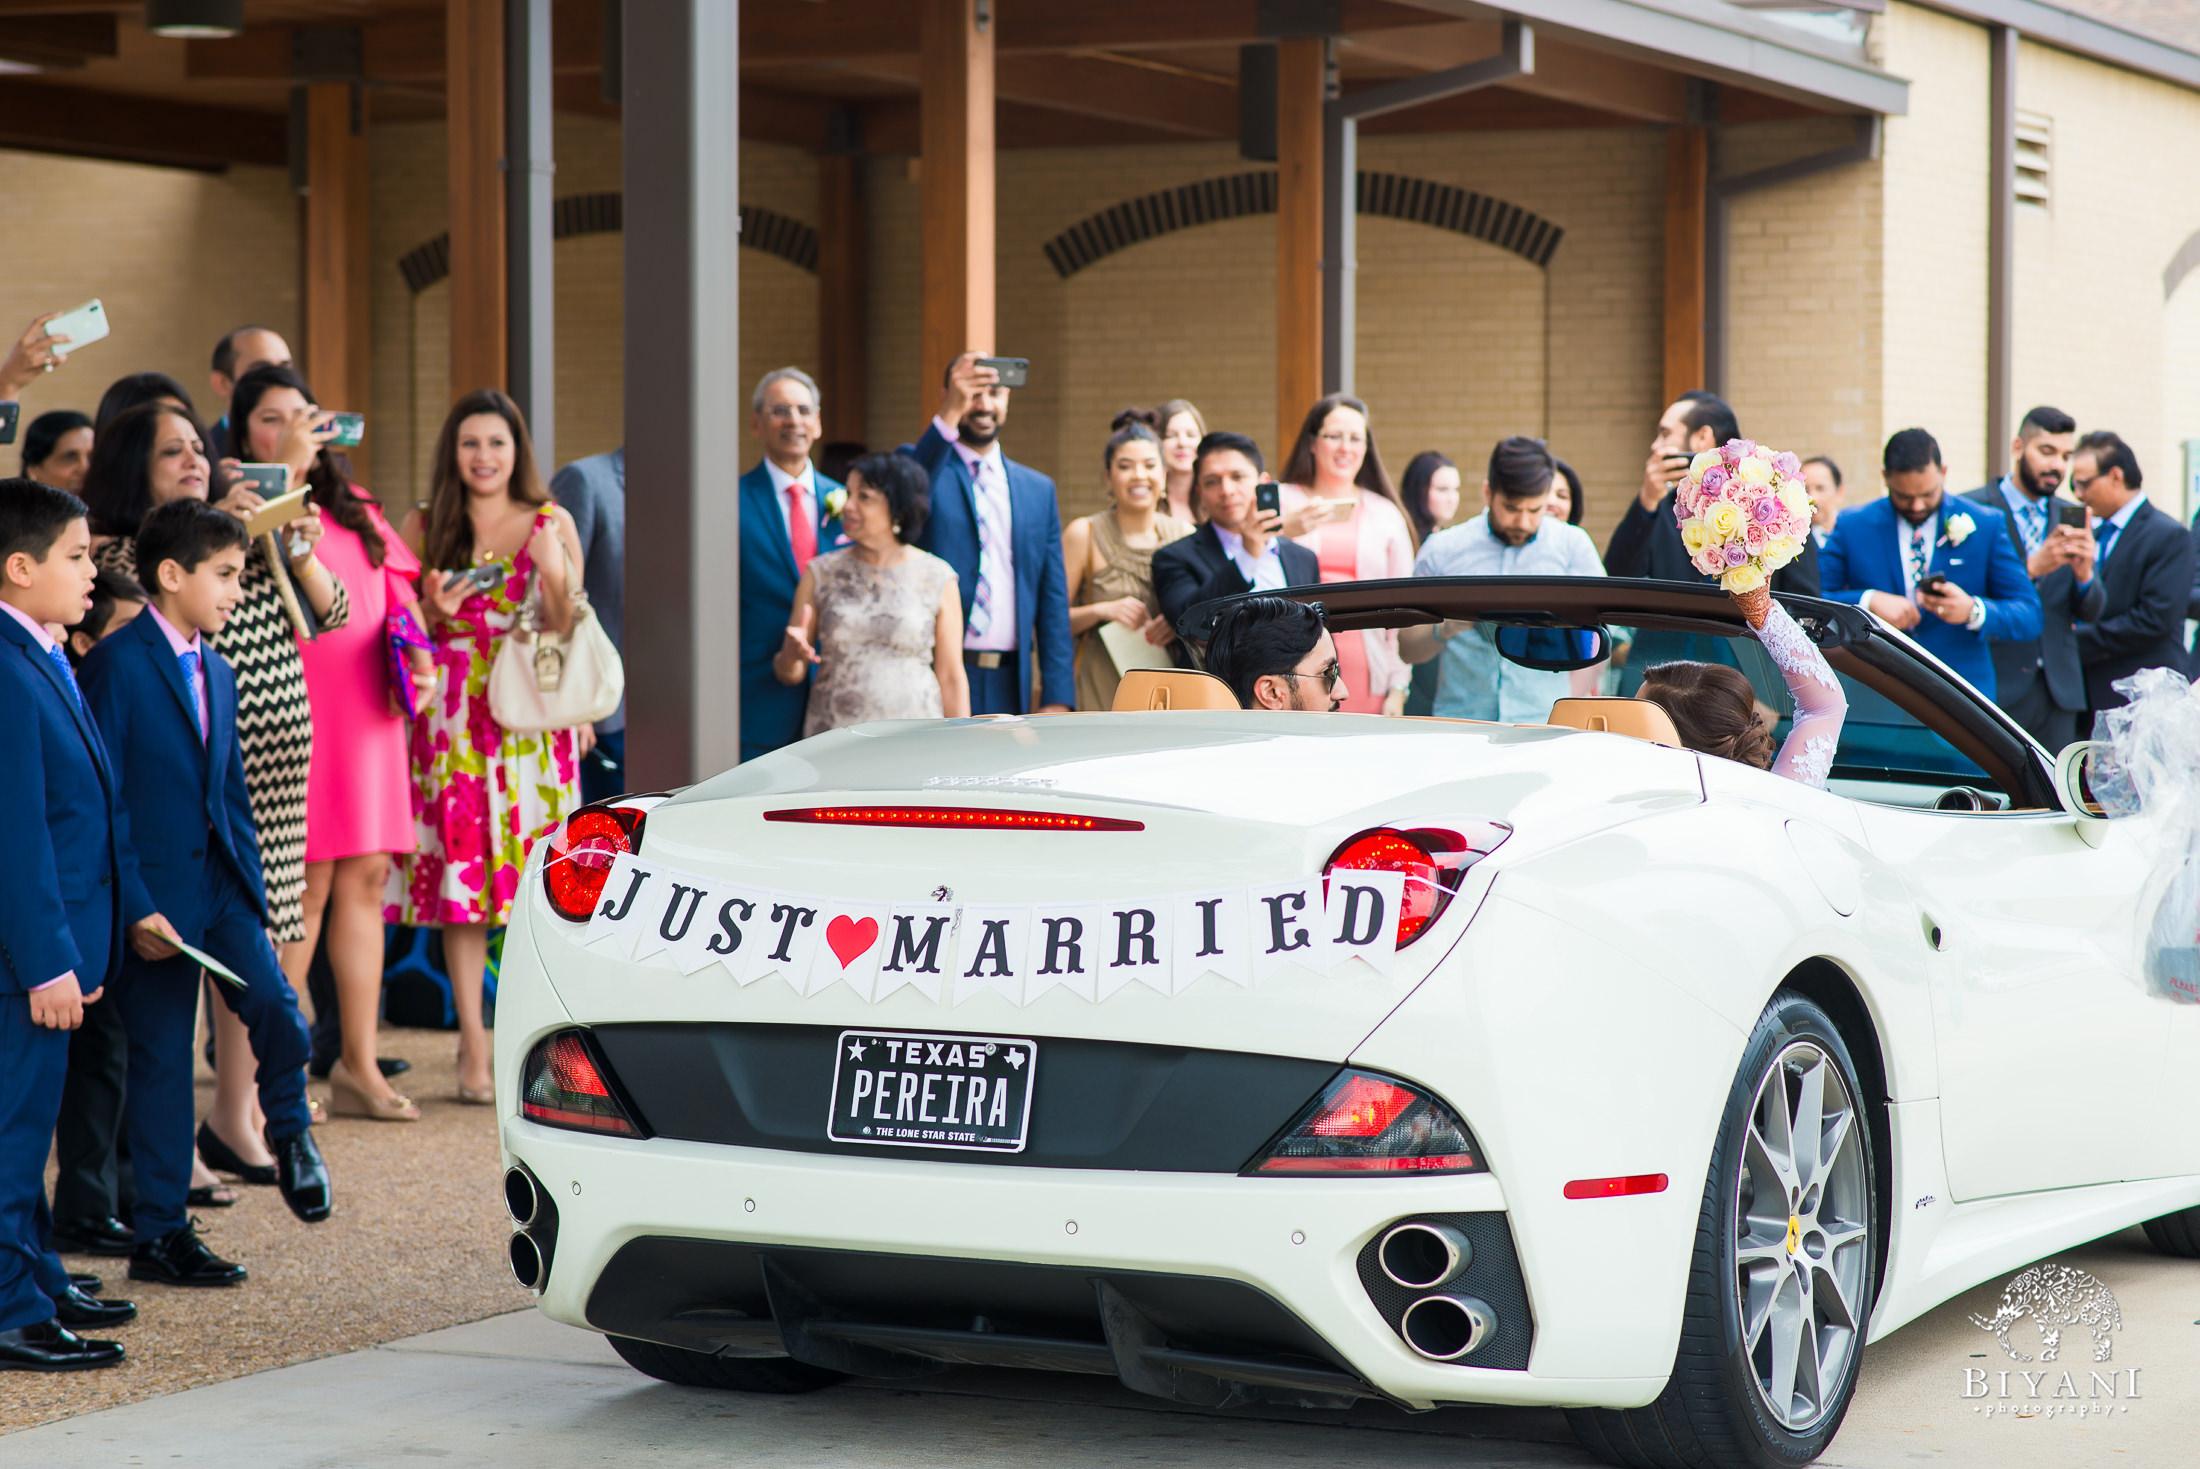 houston-weddings-farwa-arue-04.jpg